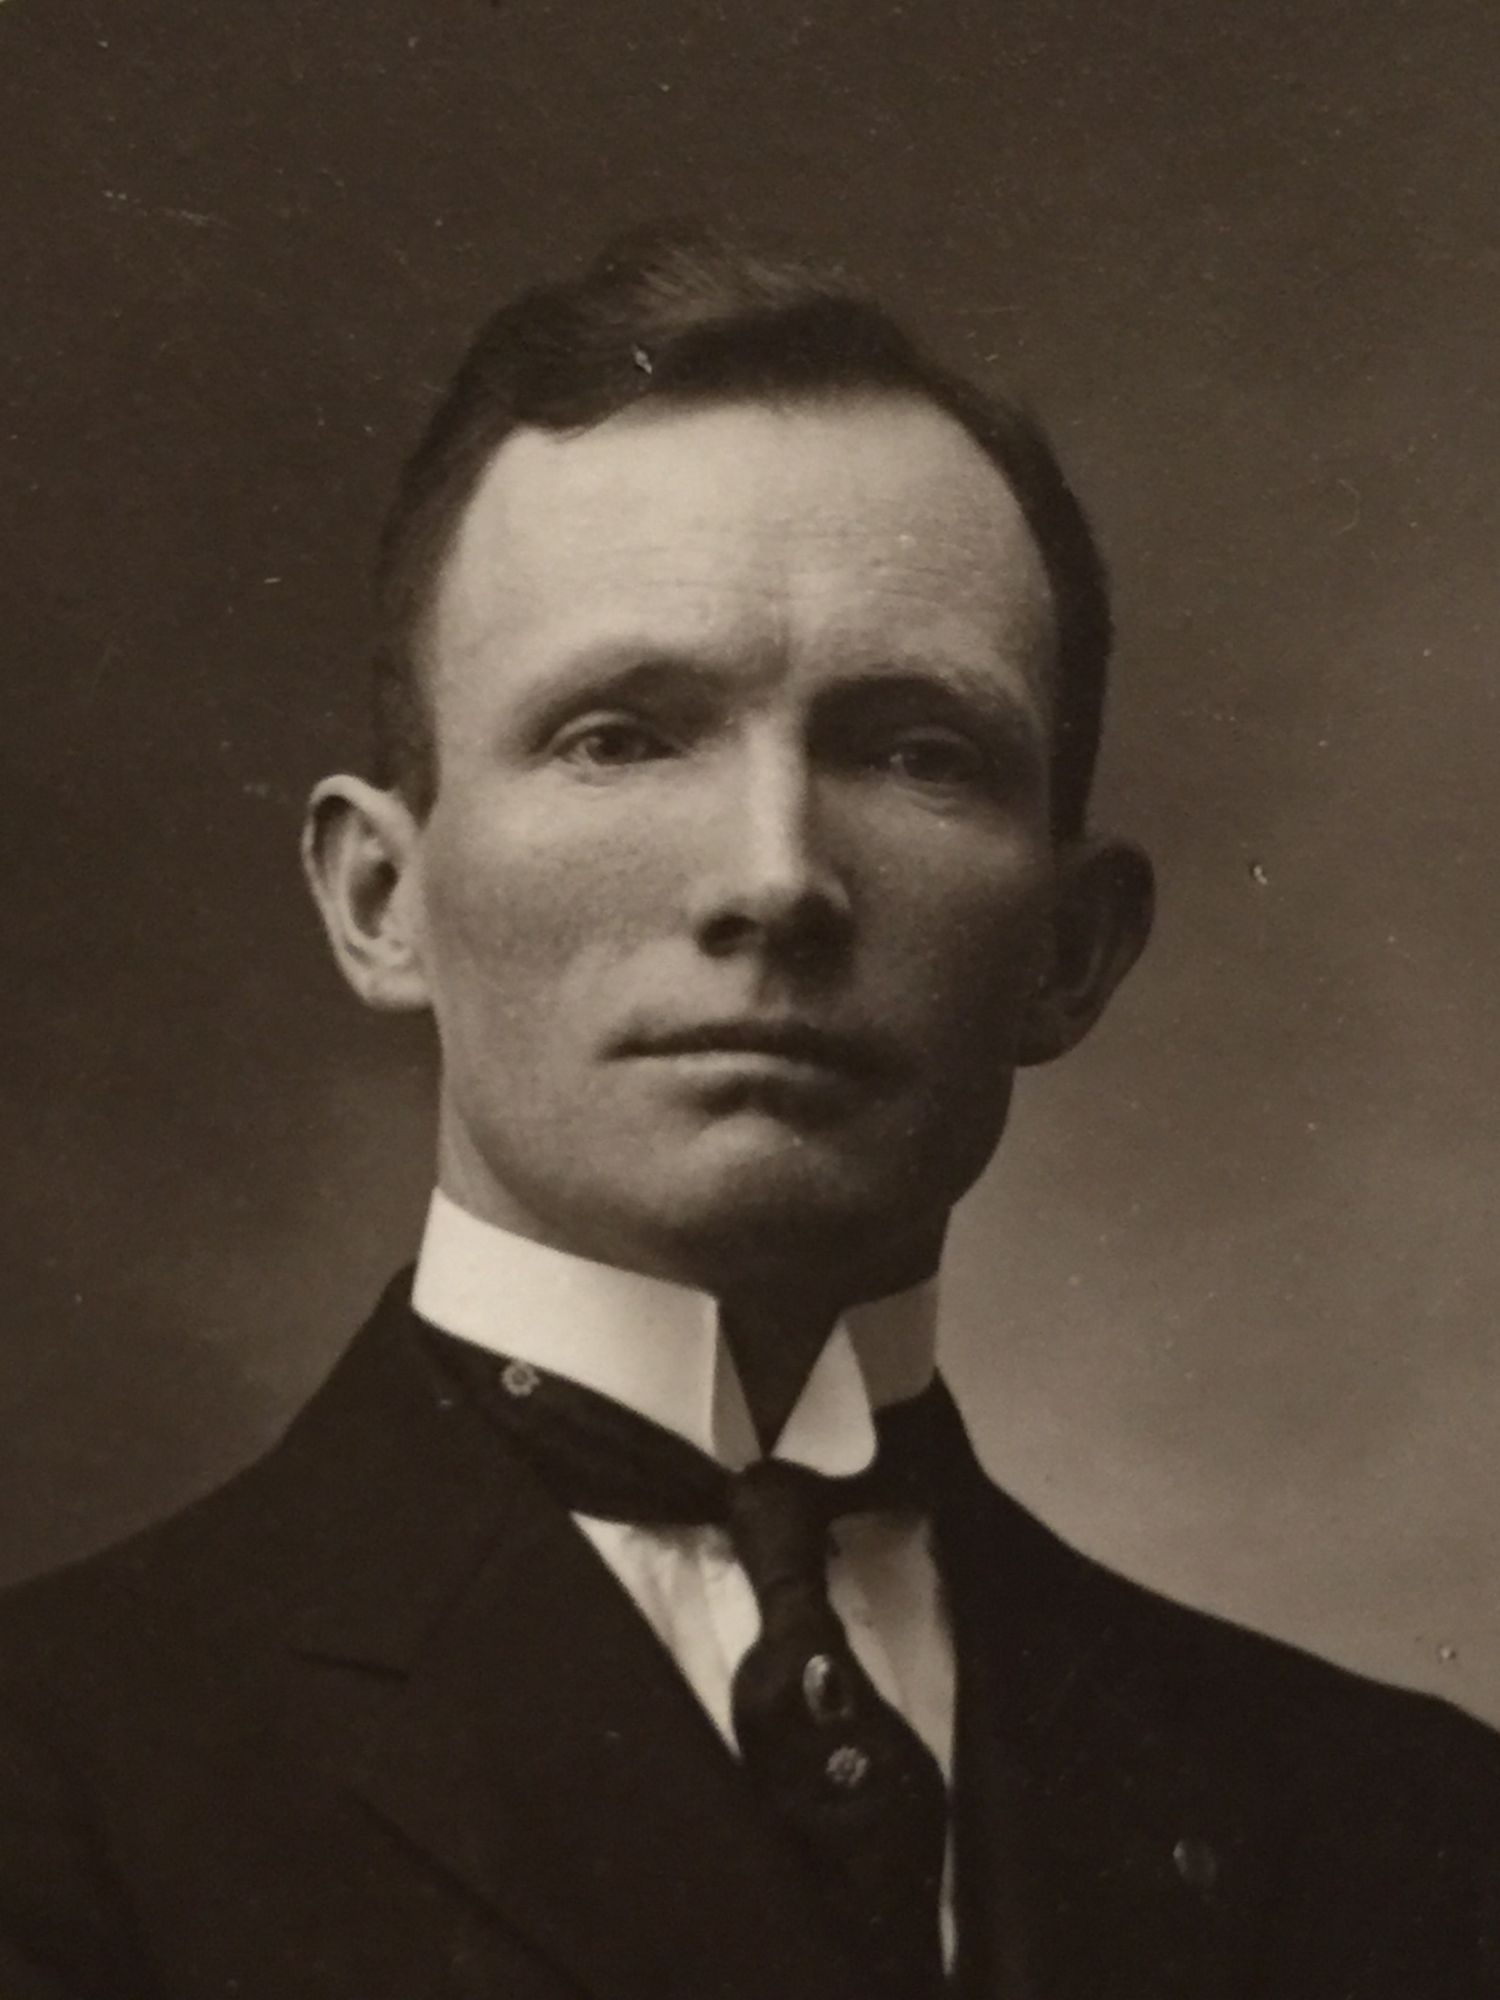 Butterworth, John Addison